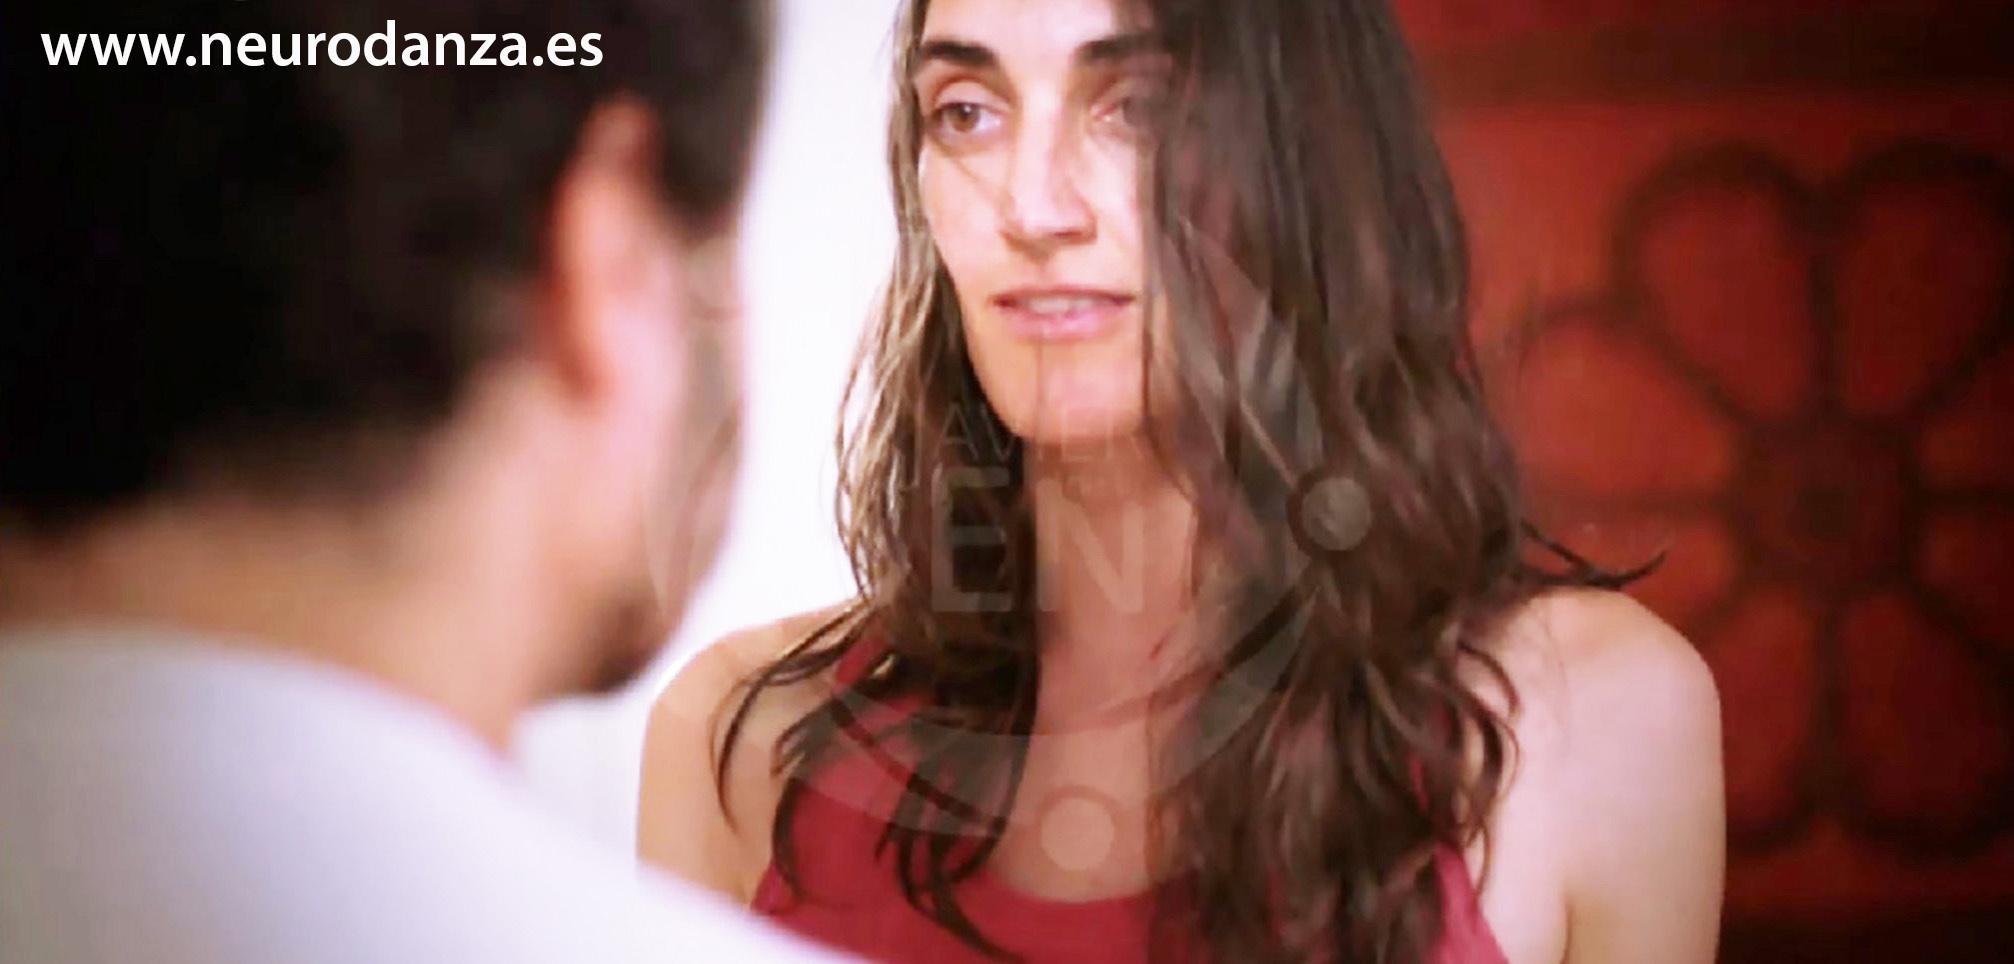 Clases-de-Danza-Neurodanza-Javier-de-la-Sen